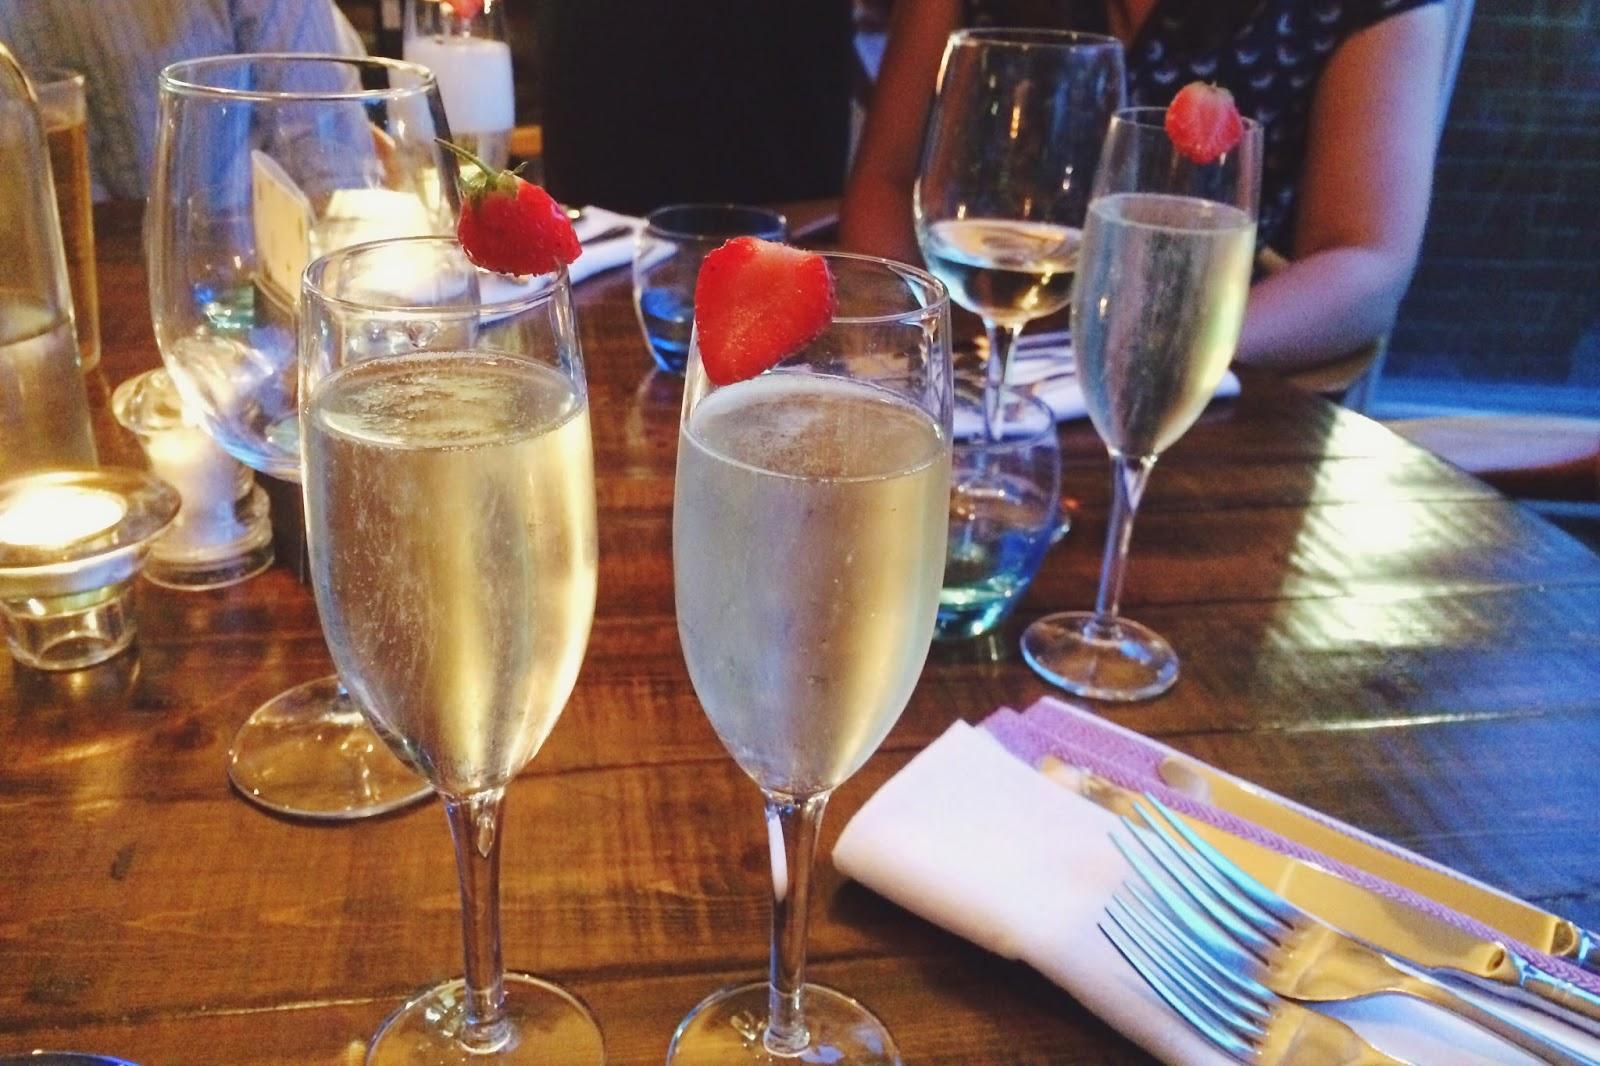 food blog, lifestyle blog, no5 bridge street, winchester restaurant